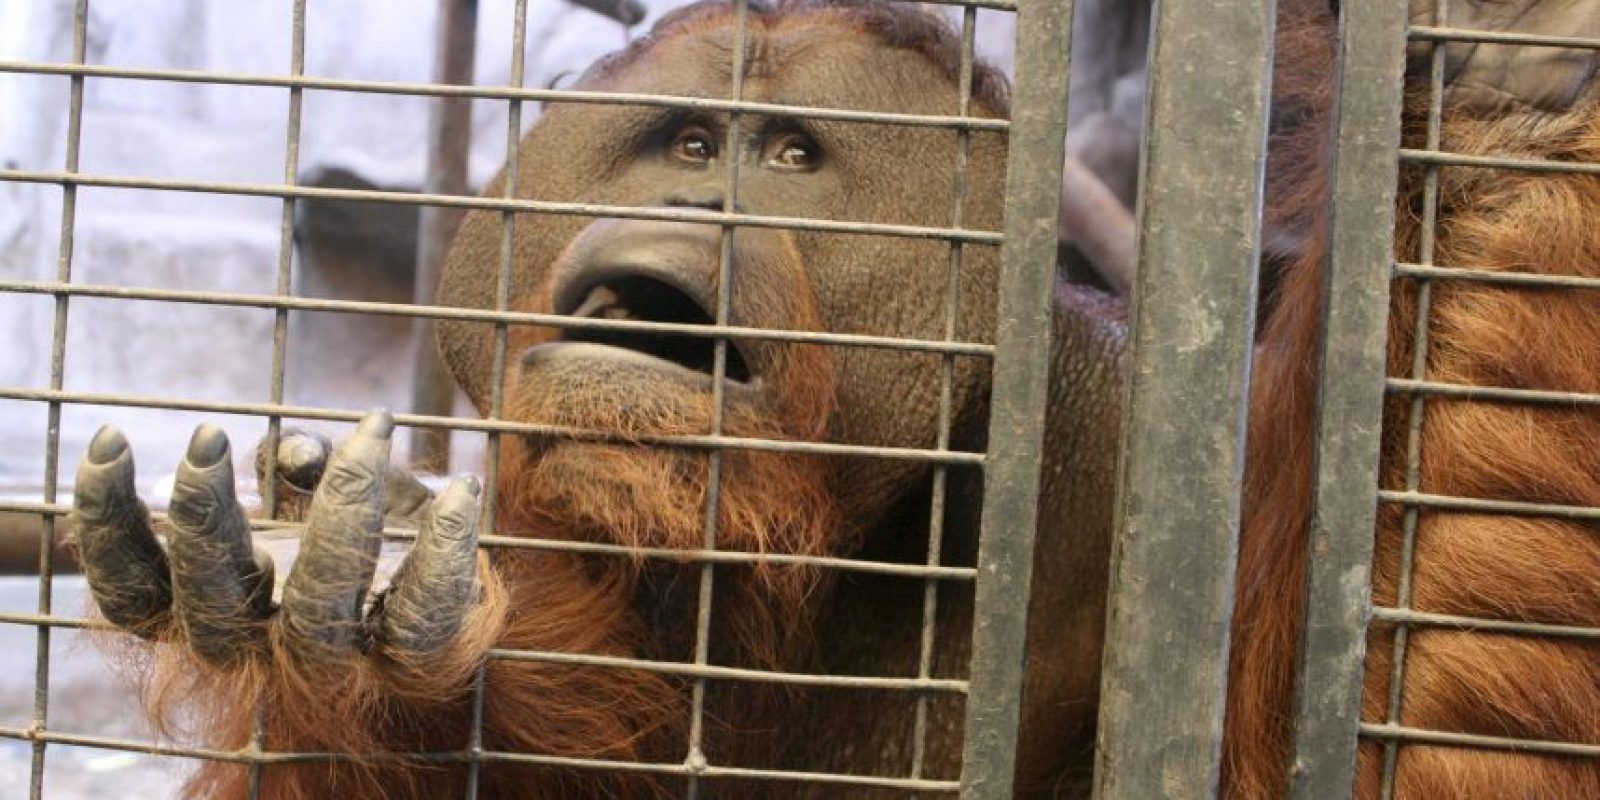 Este orangután, que vive en cautiverio, parece que estuviera conversando de un tema que le causa mucha nostalgia.Foto: EFE